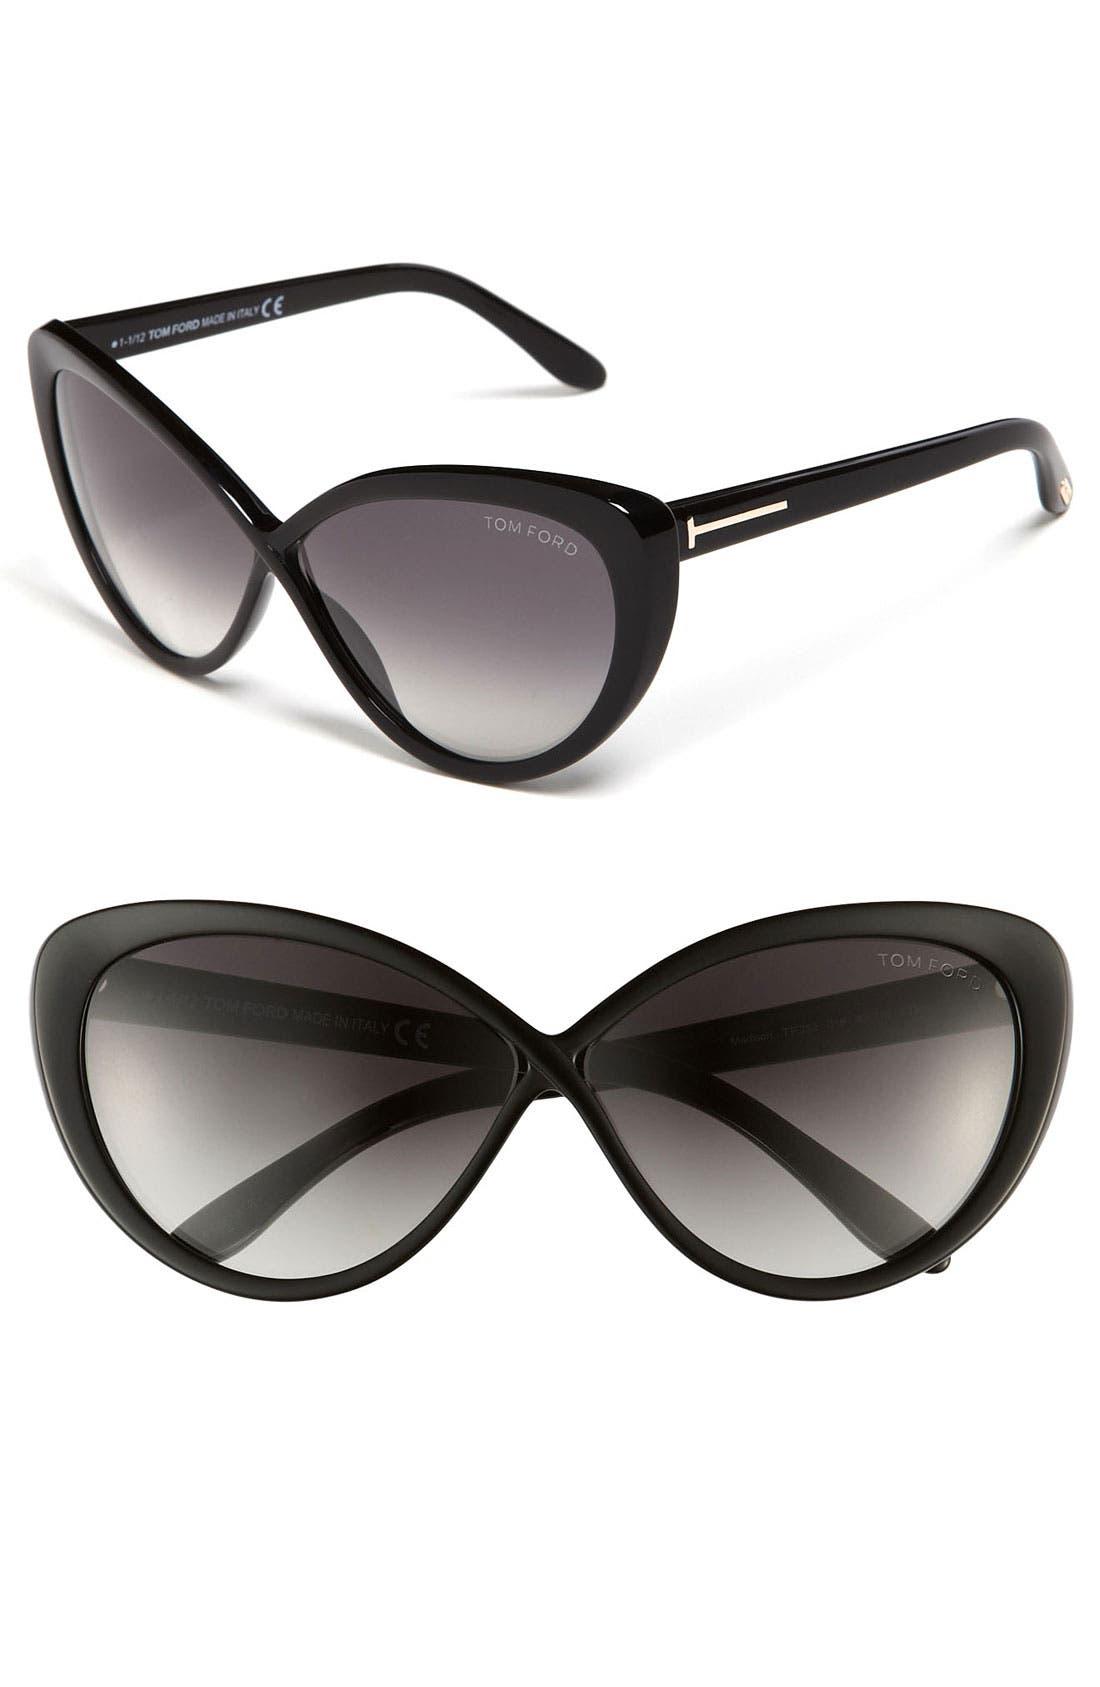 Main Image - Tom Ford 'Madison' 63mm Retro Sunglasses